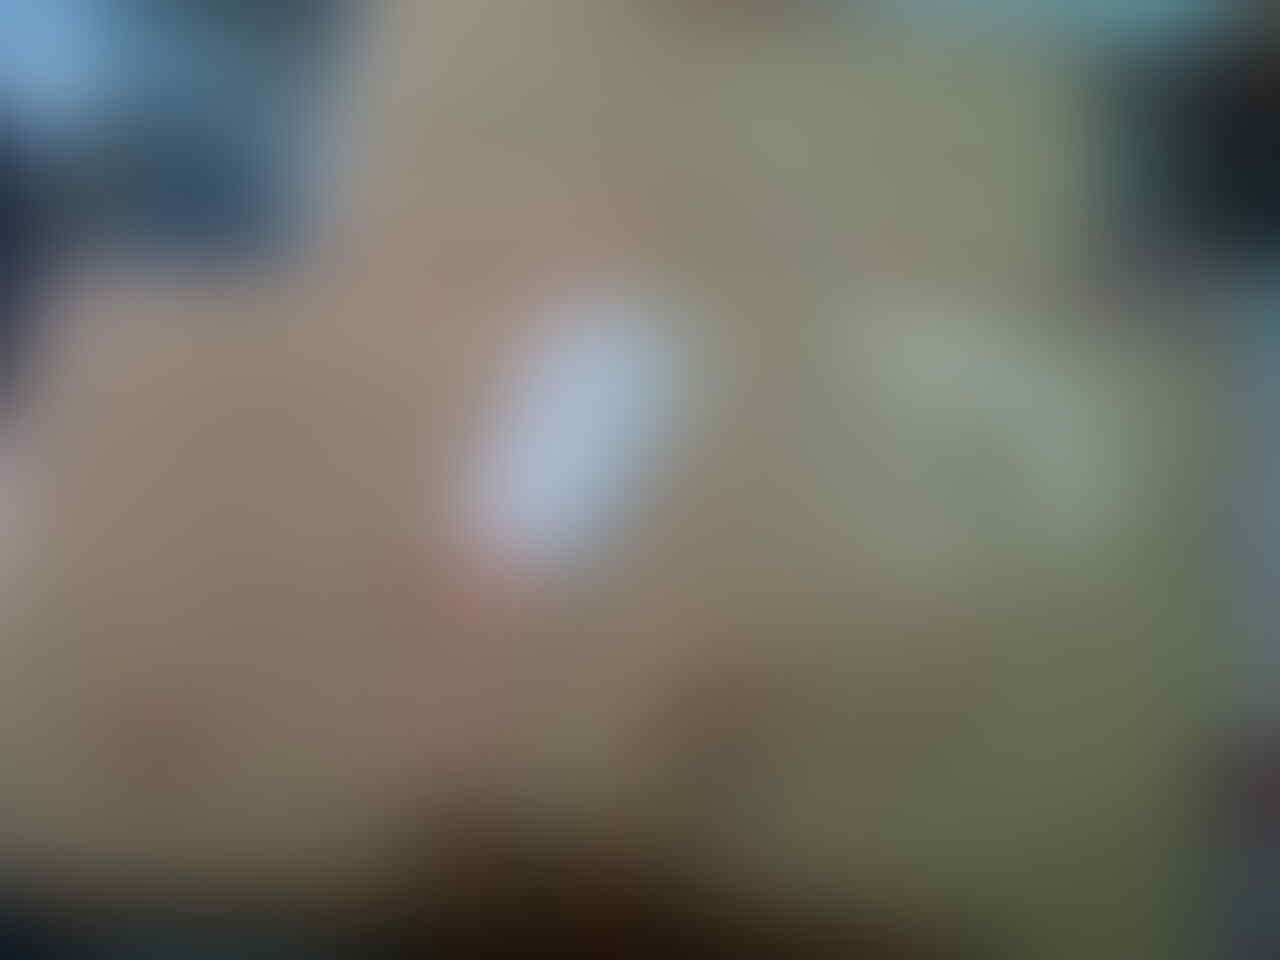 ▷-»» RA.Raden - Jasa Custom Conjure / Isian dan Kuncian Khodam media Vessel ««-◁